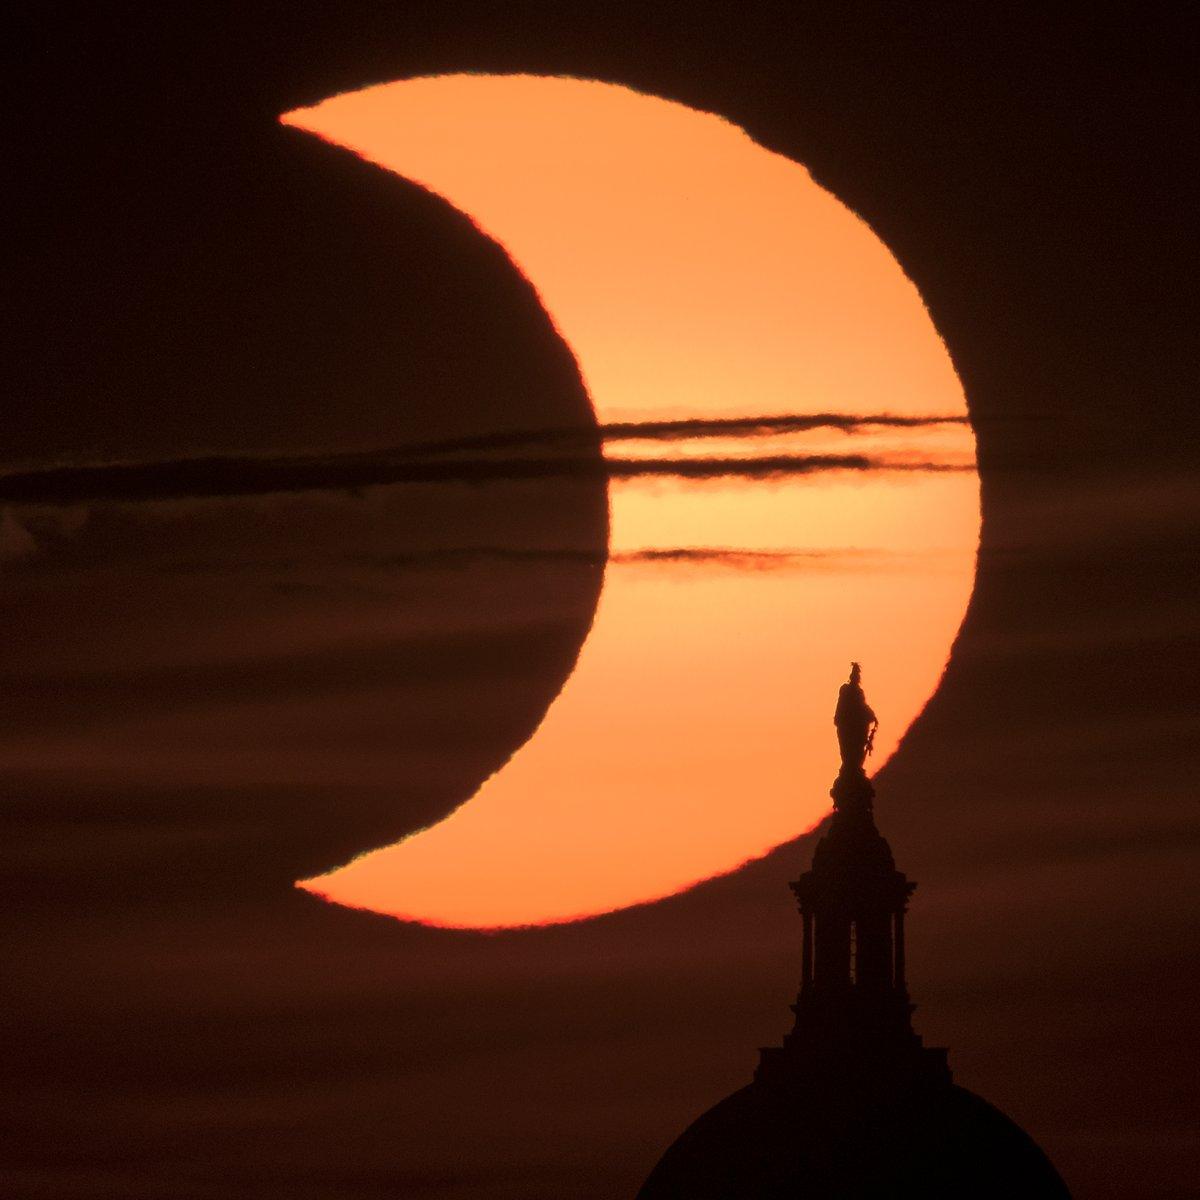 @ingallsimages's photo on #SolarEclipse